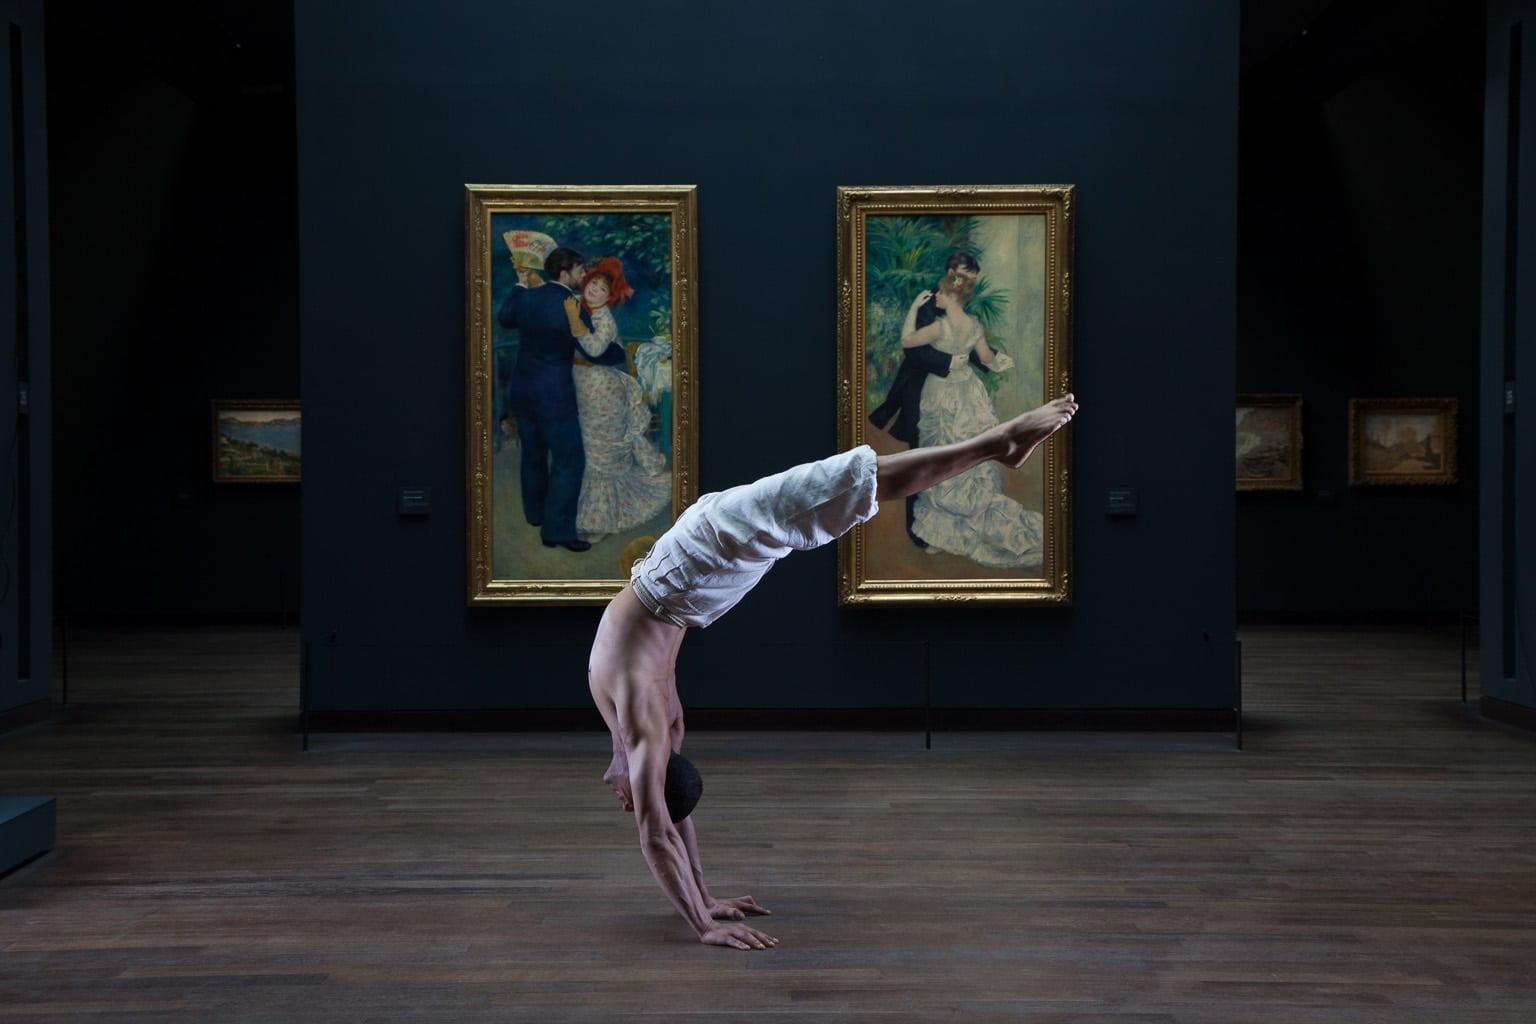 laurent-bienaime-musee-orsay-renoir